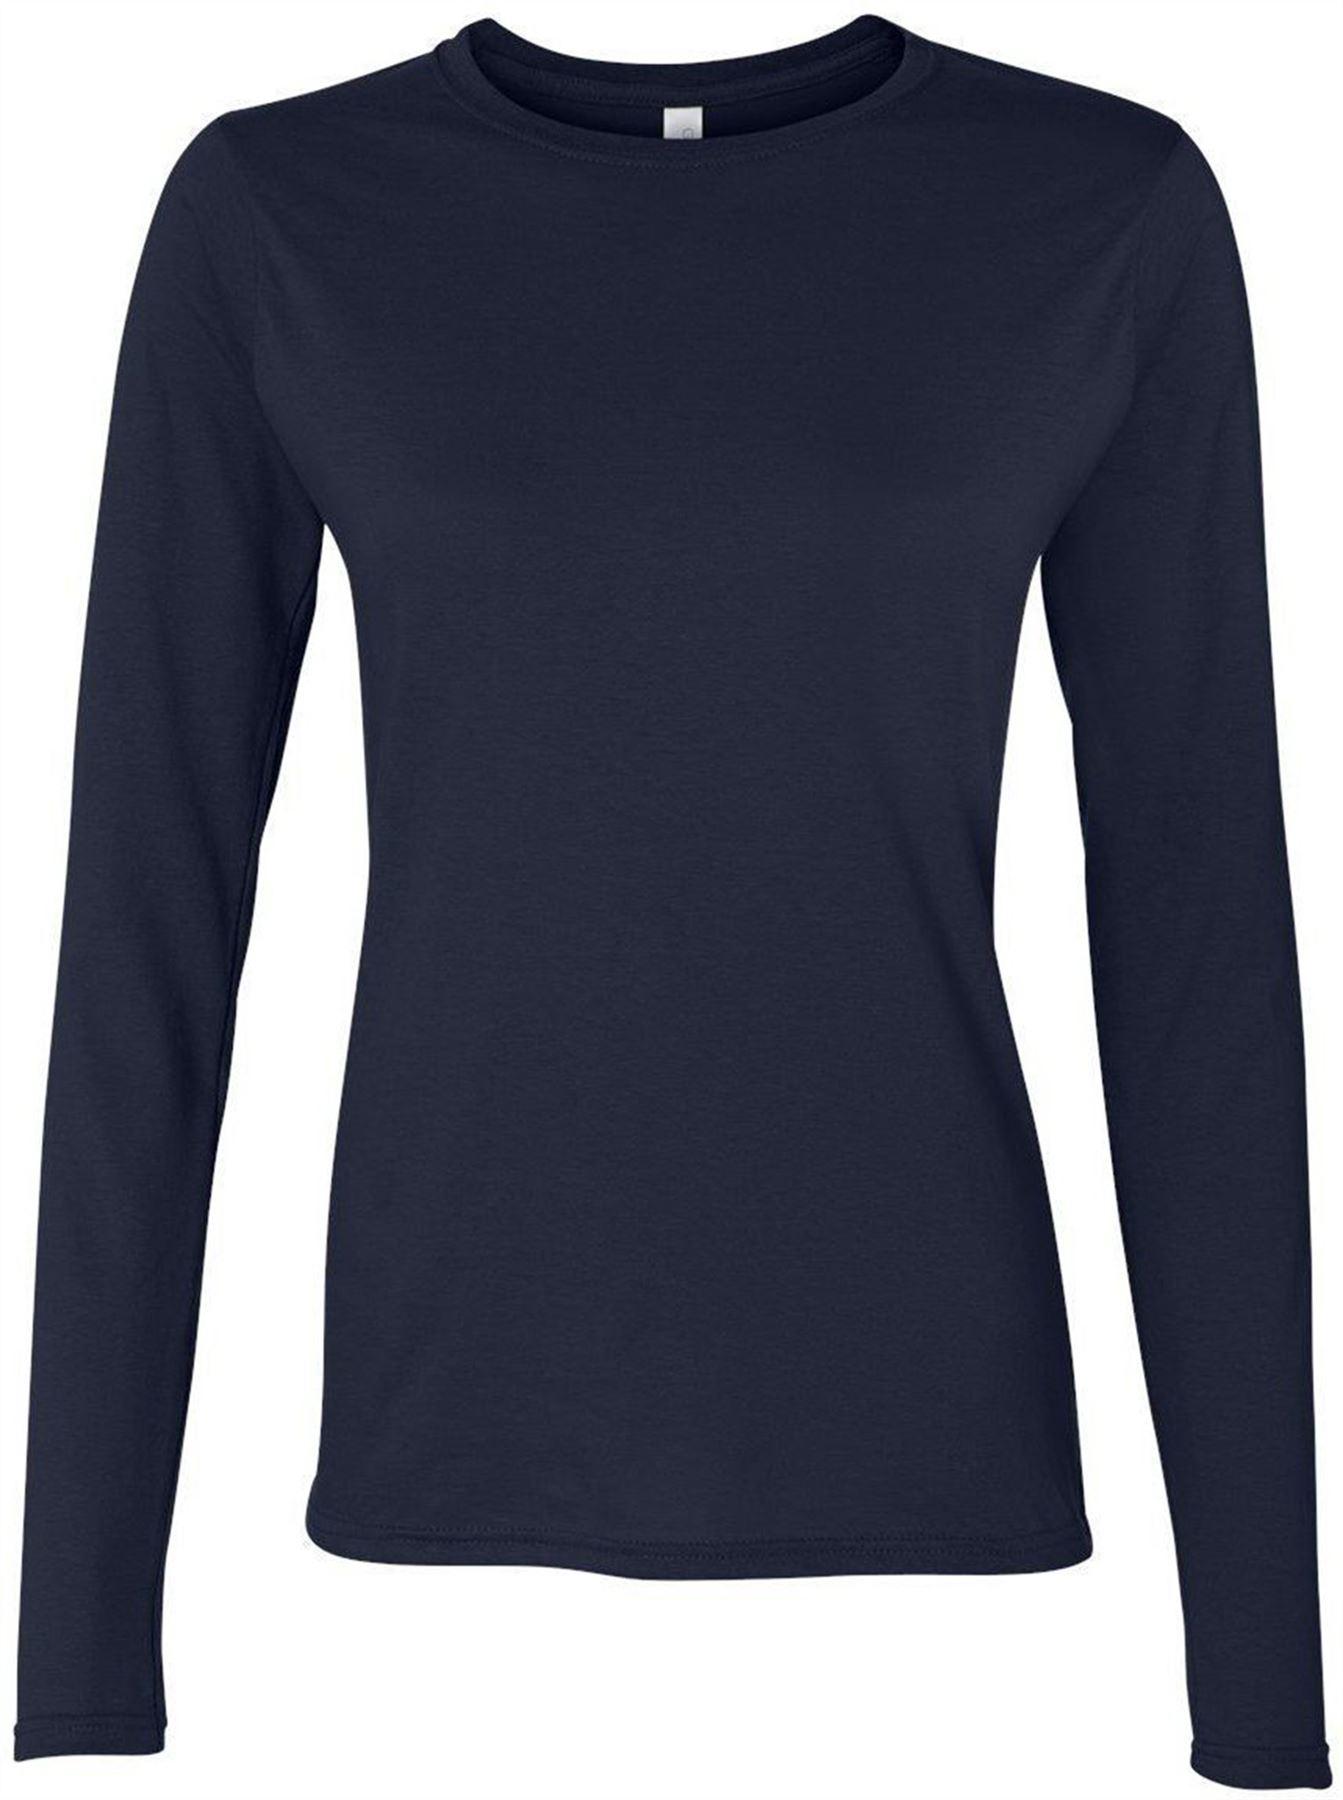 Gildan performance womens ladies blank t shirt long for Blank long sleeve shirt